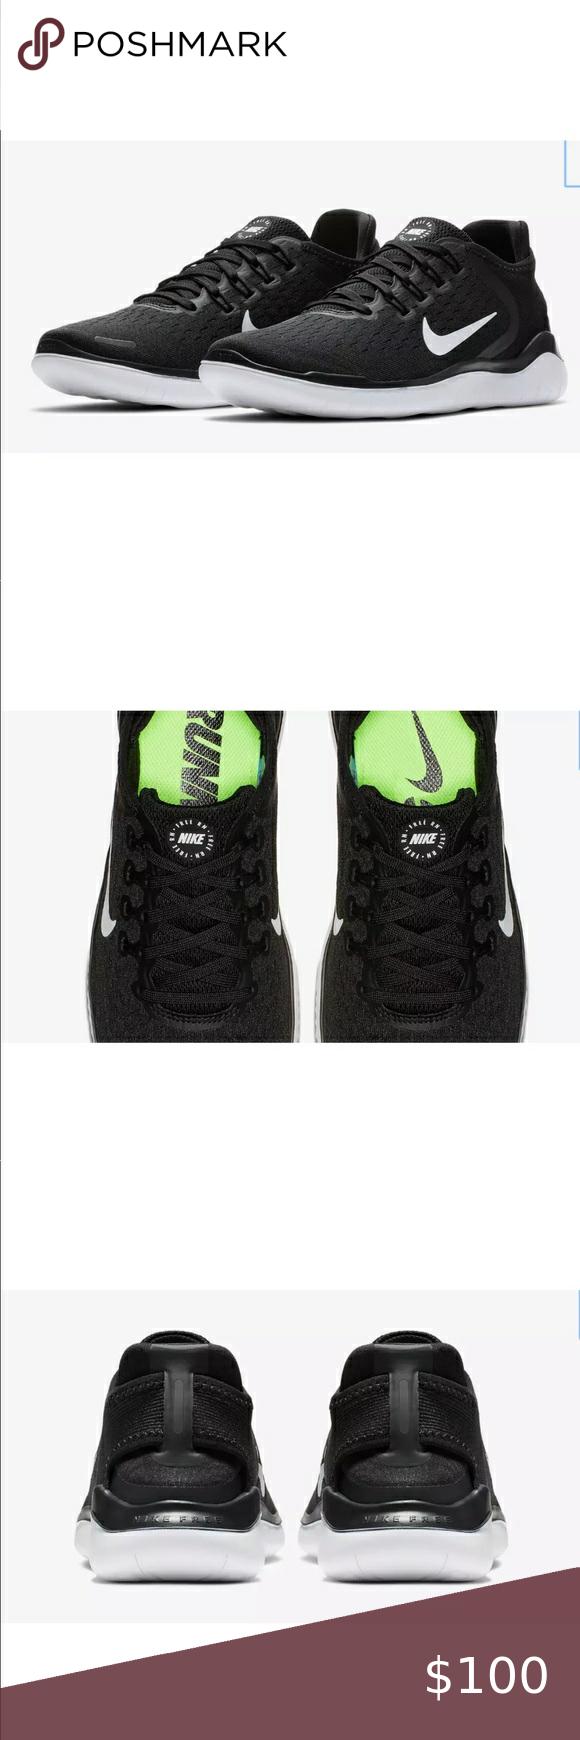 Nike Women's Free RN 2018 Running Shoe Black/White NWT in ...